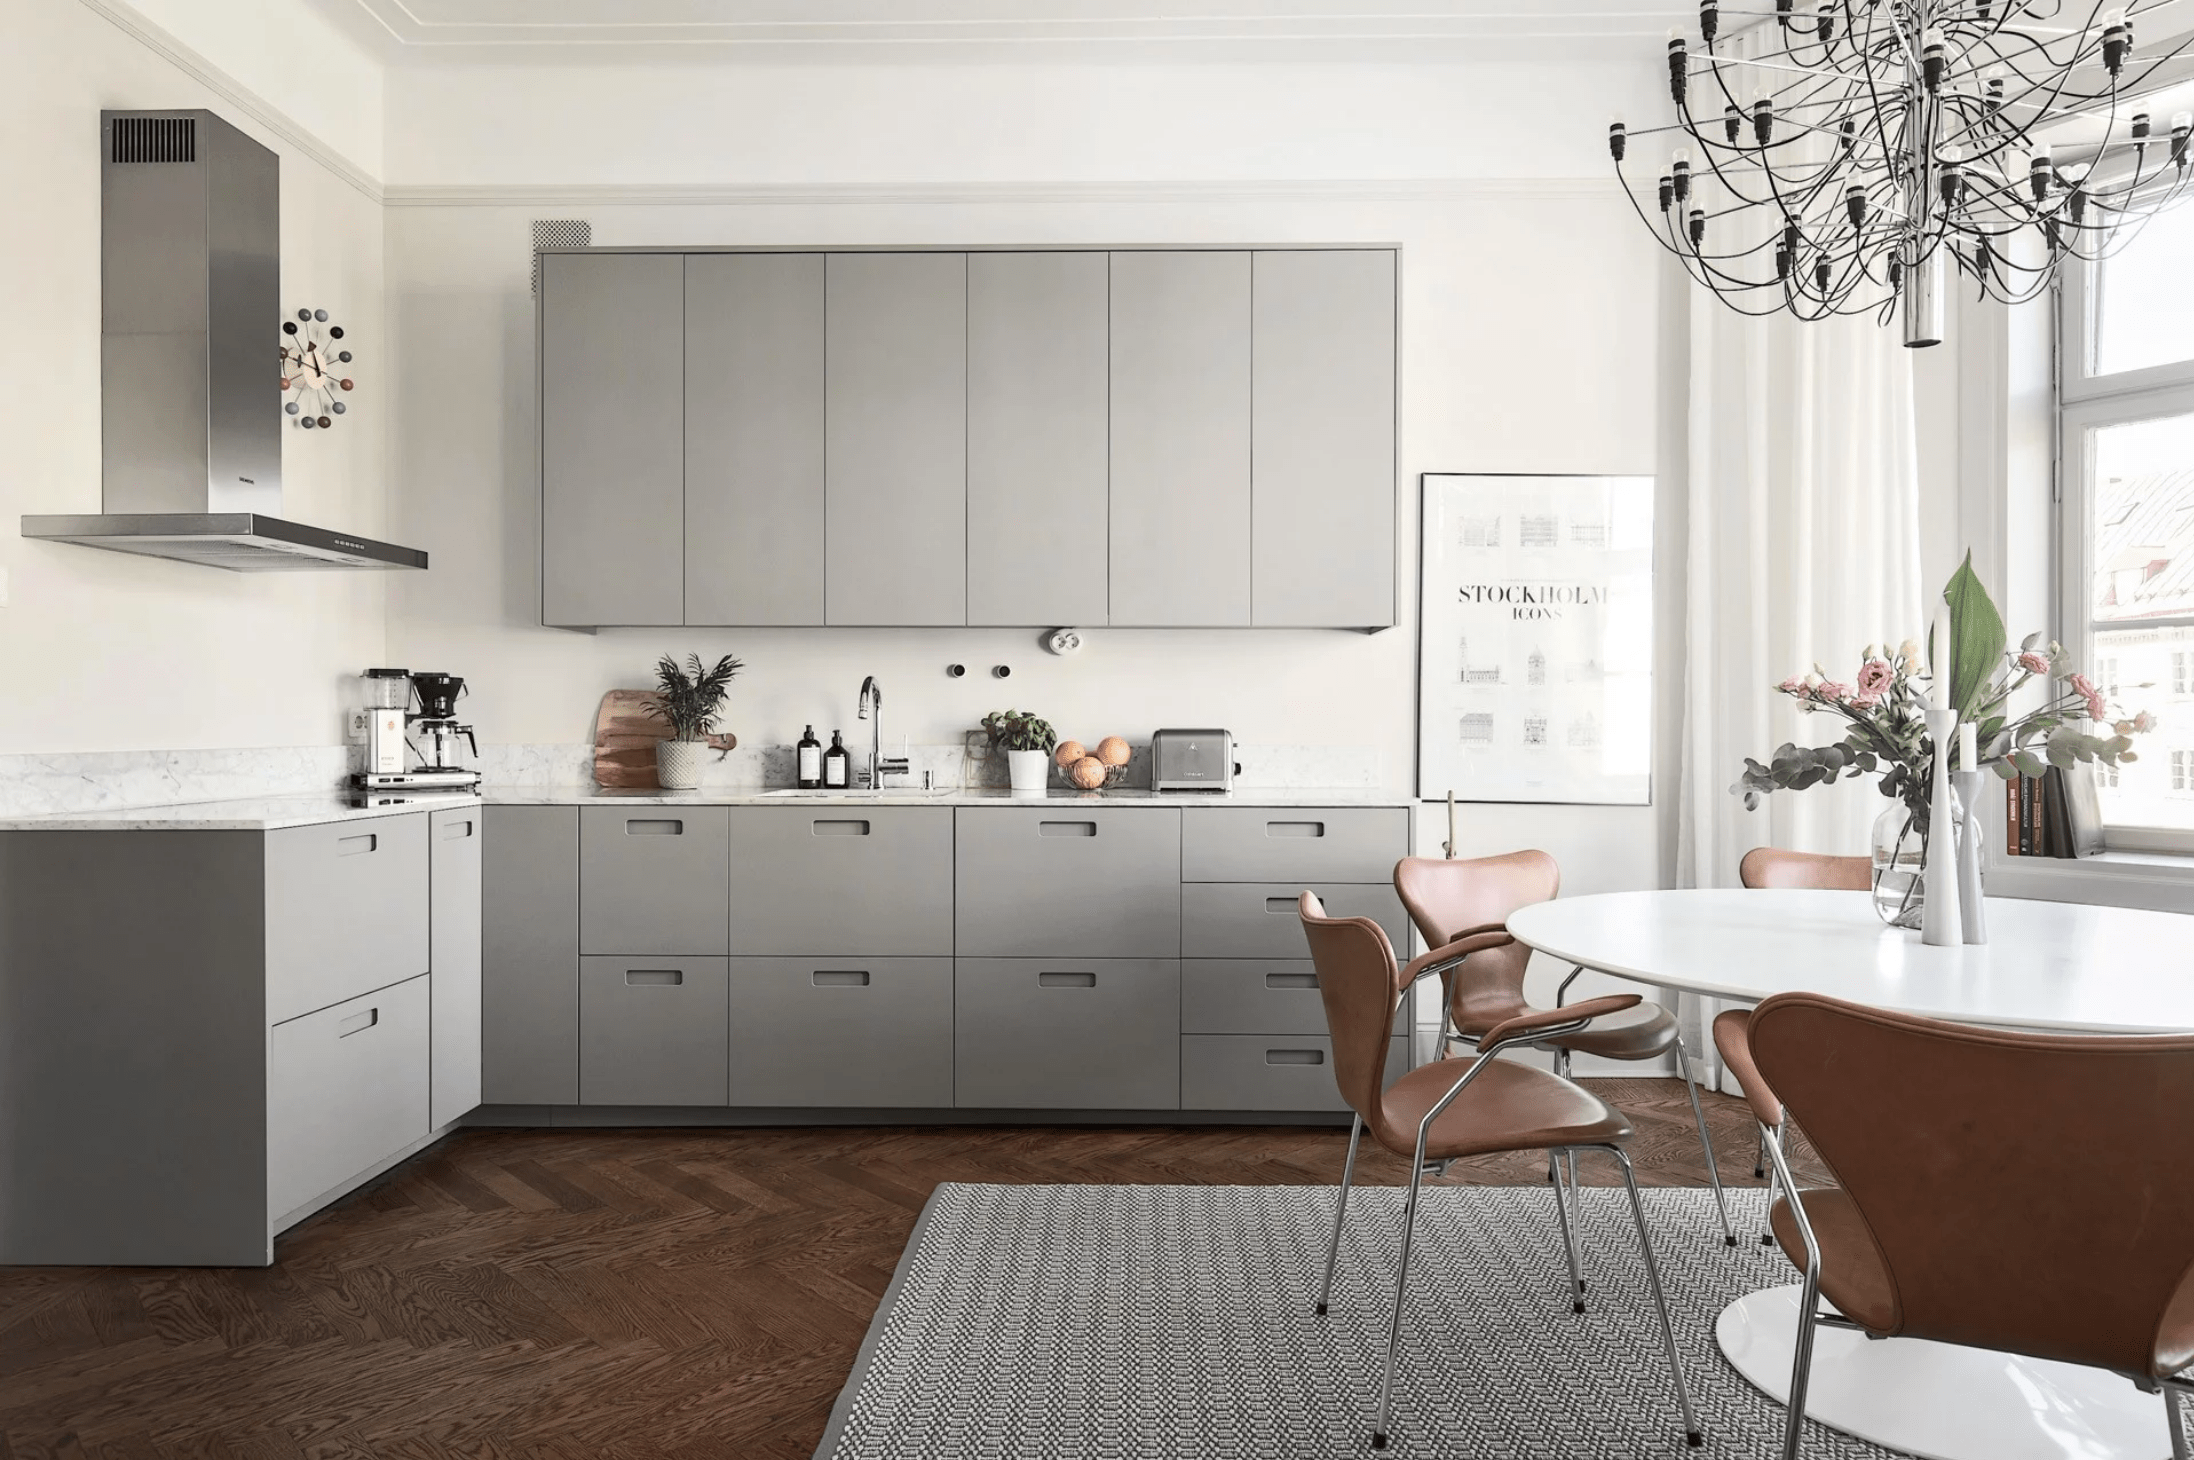 Minimal Kitchen With Large Dining Area  Coco Lapine Designcoco